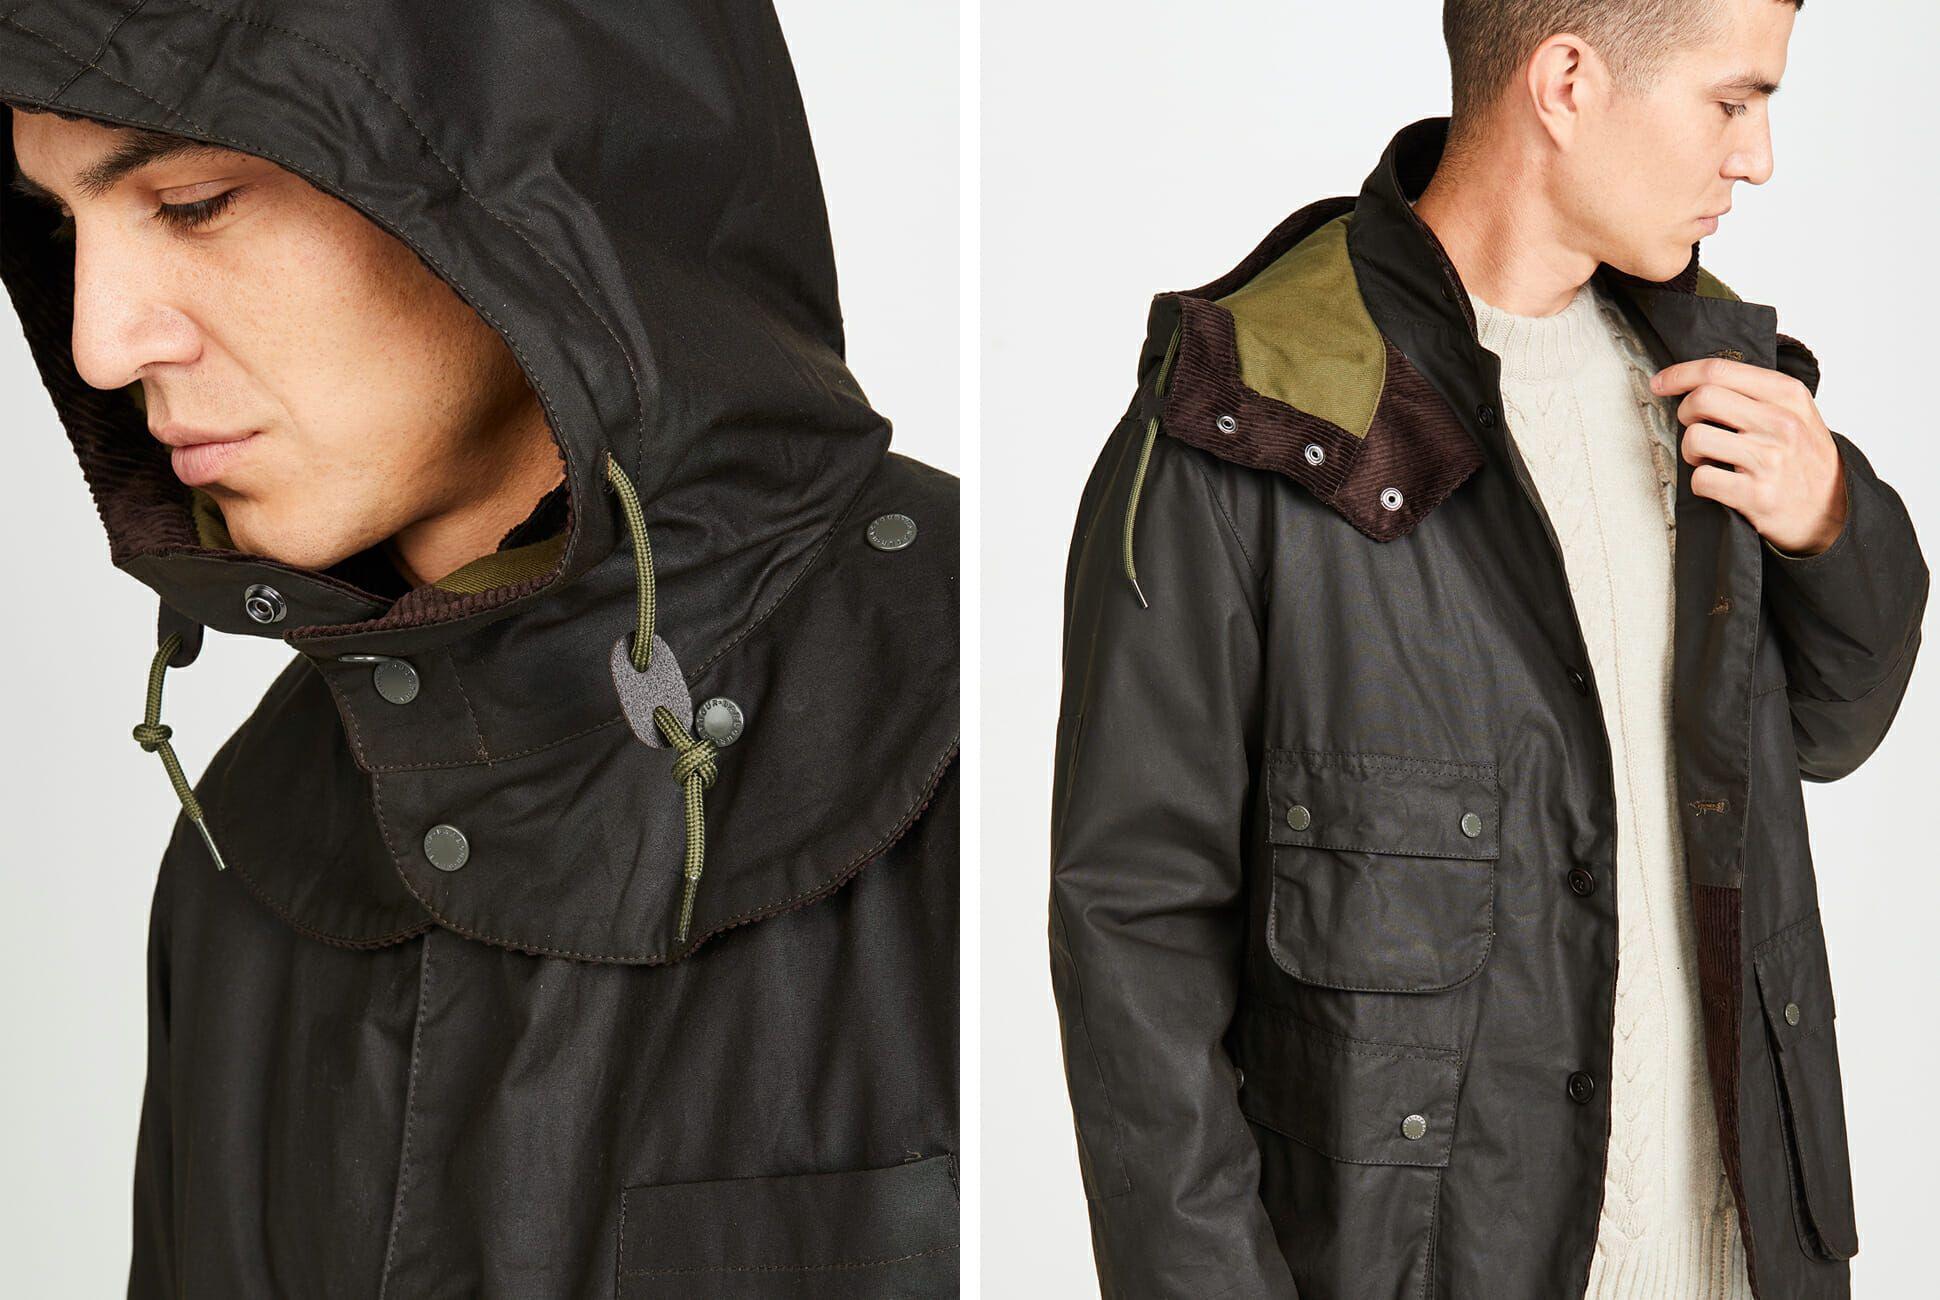 discount barbour jackets